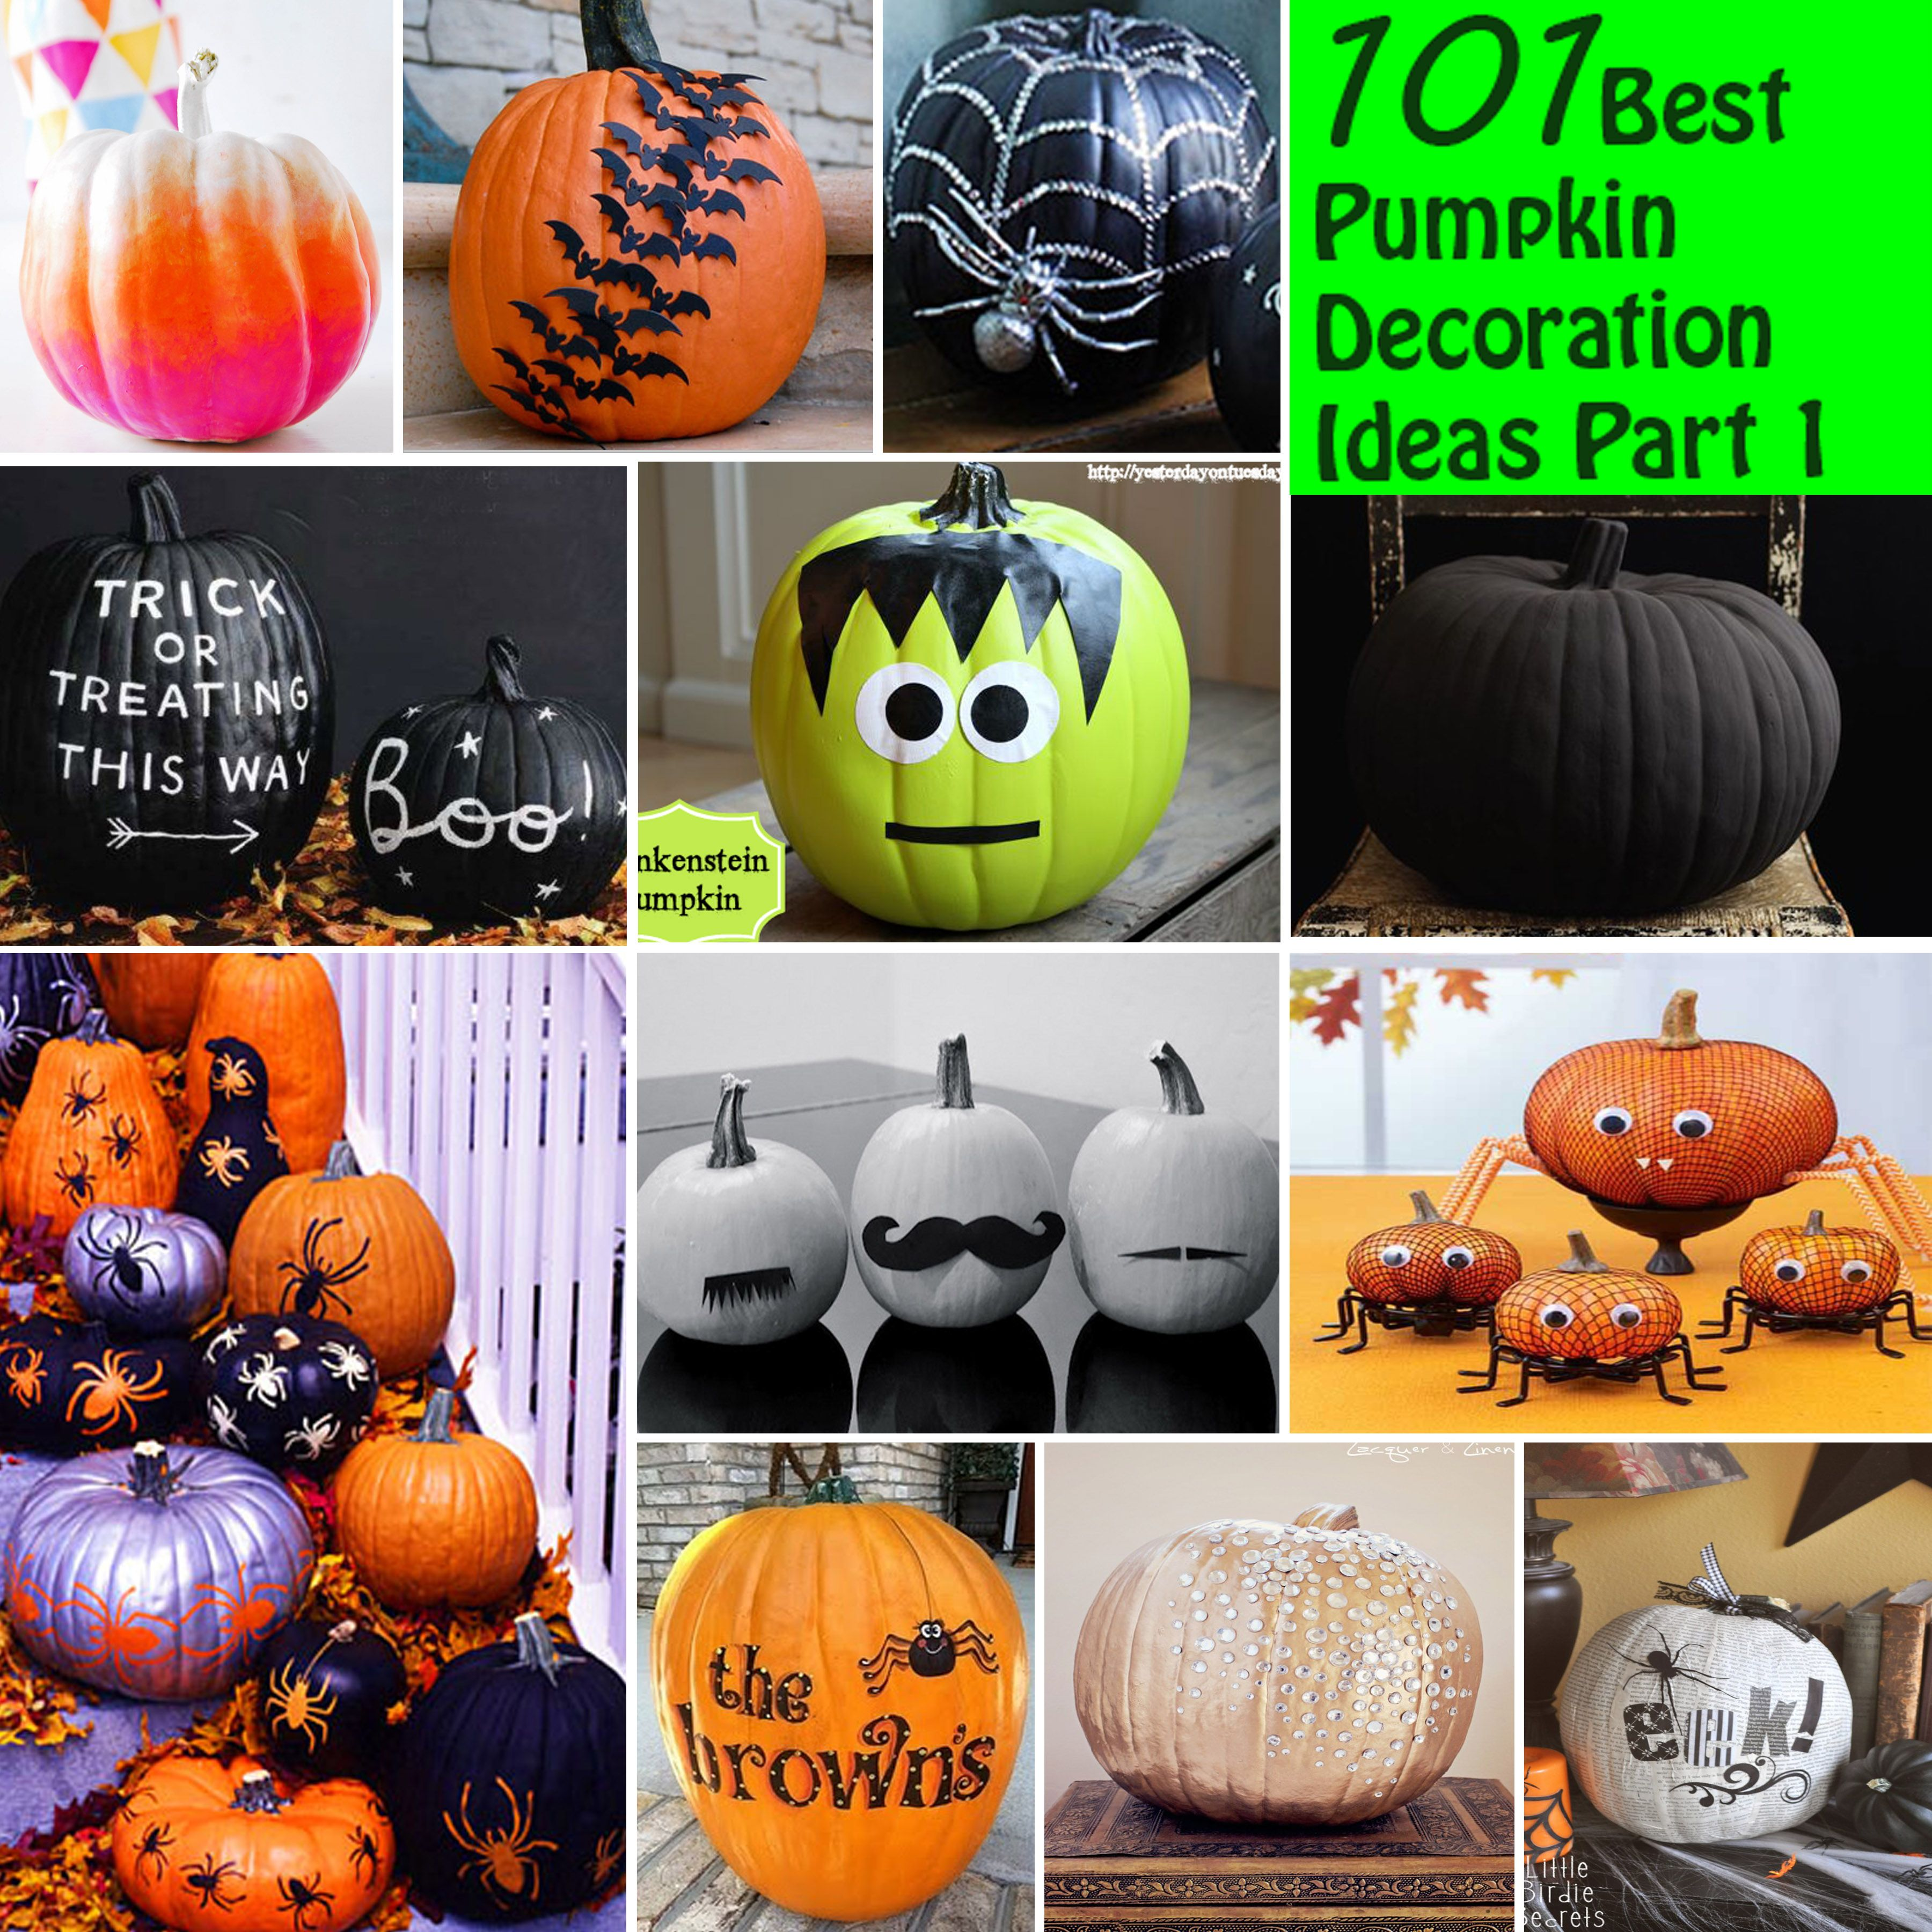 101 Best Pumpkin Decoration Ideas Part 1